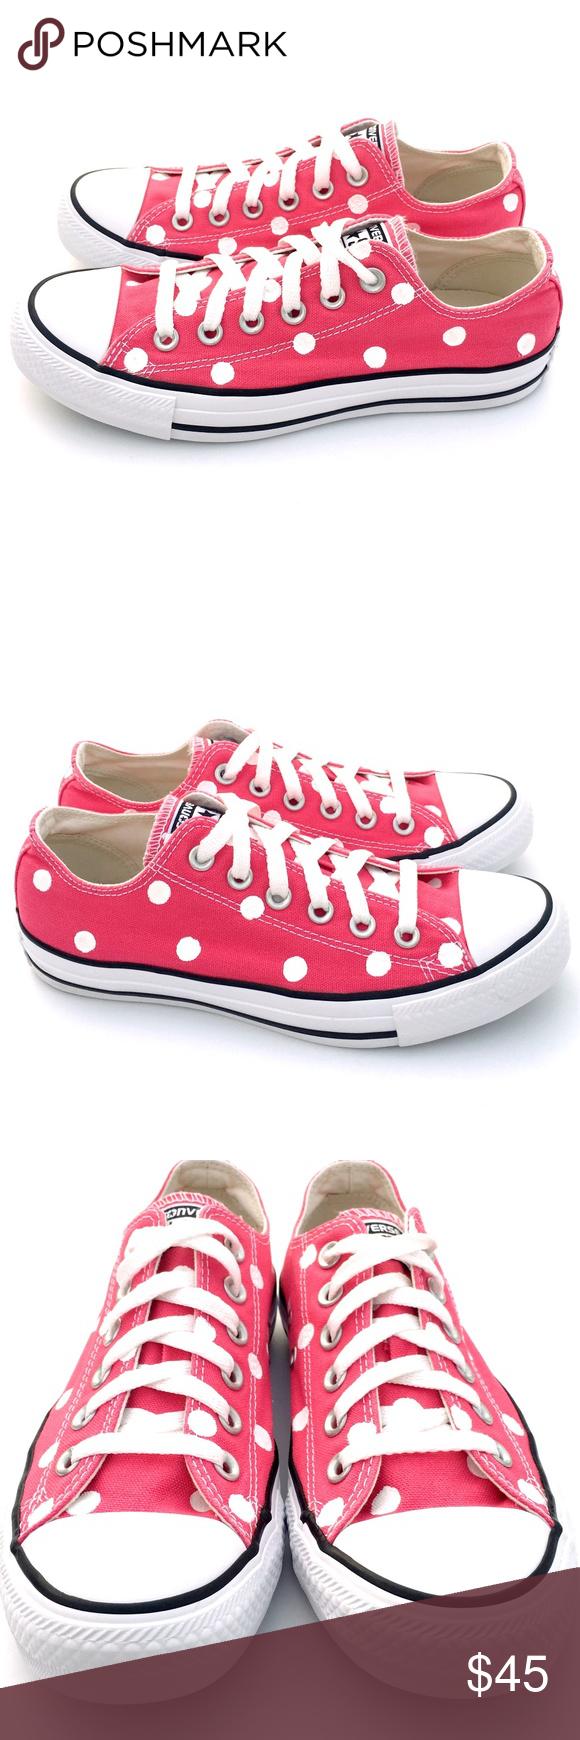 84e102b5ea9399 Converse 7 RASPBERRY Pink Polka Dot CTAS Hand painted unisex Converse Chuck  Taylor All-Star